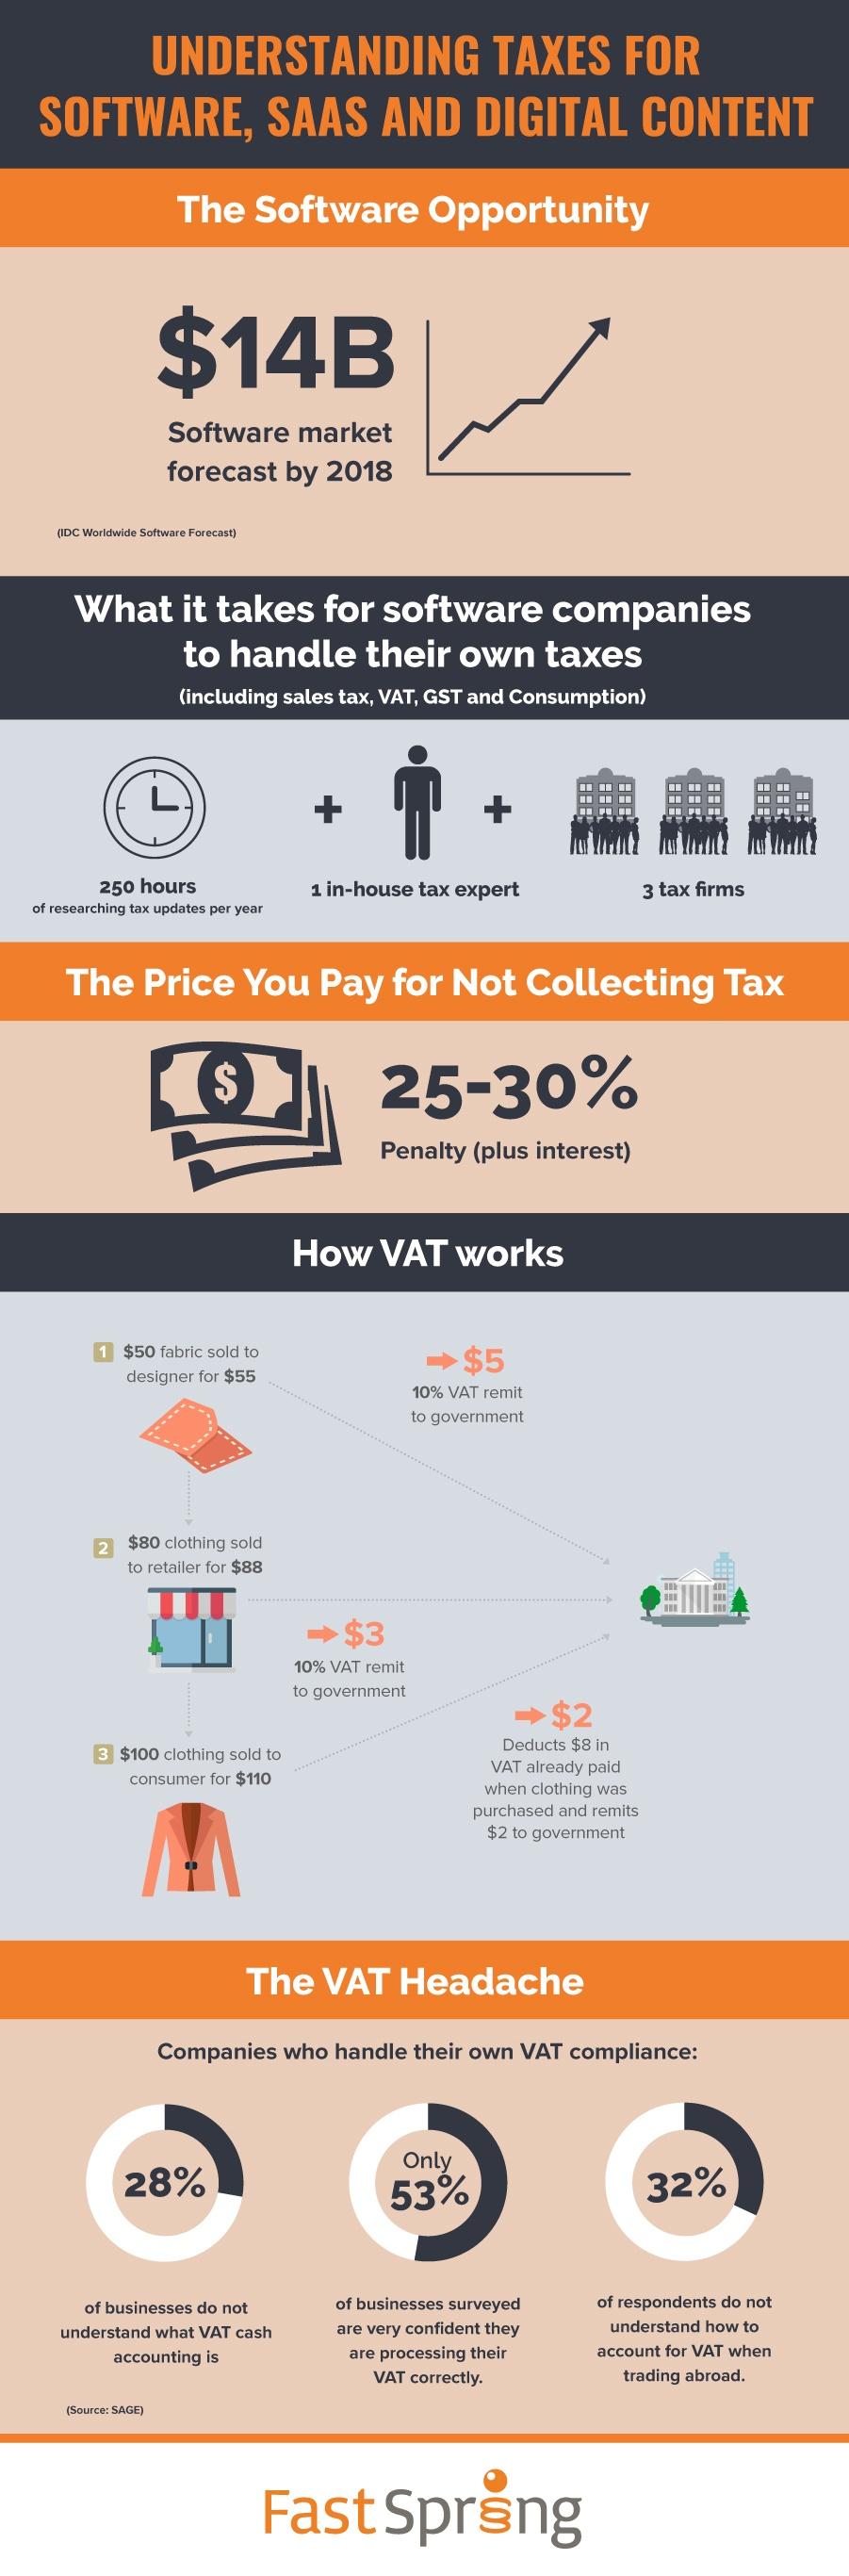 FastSpring_Tax_Infographic.jpg